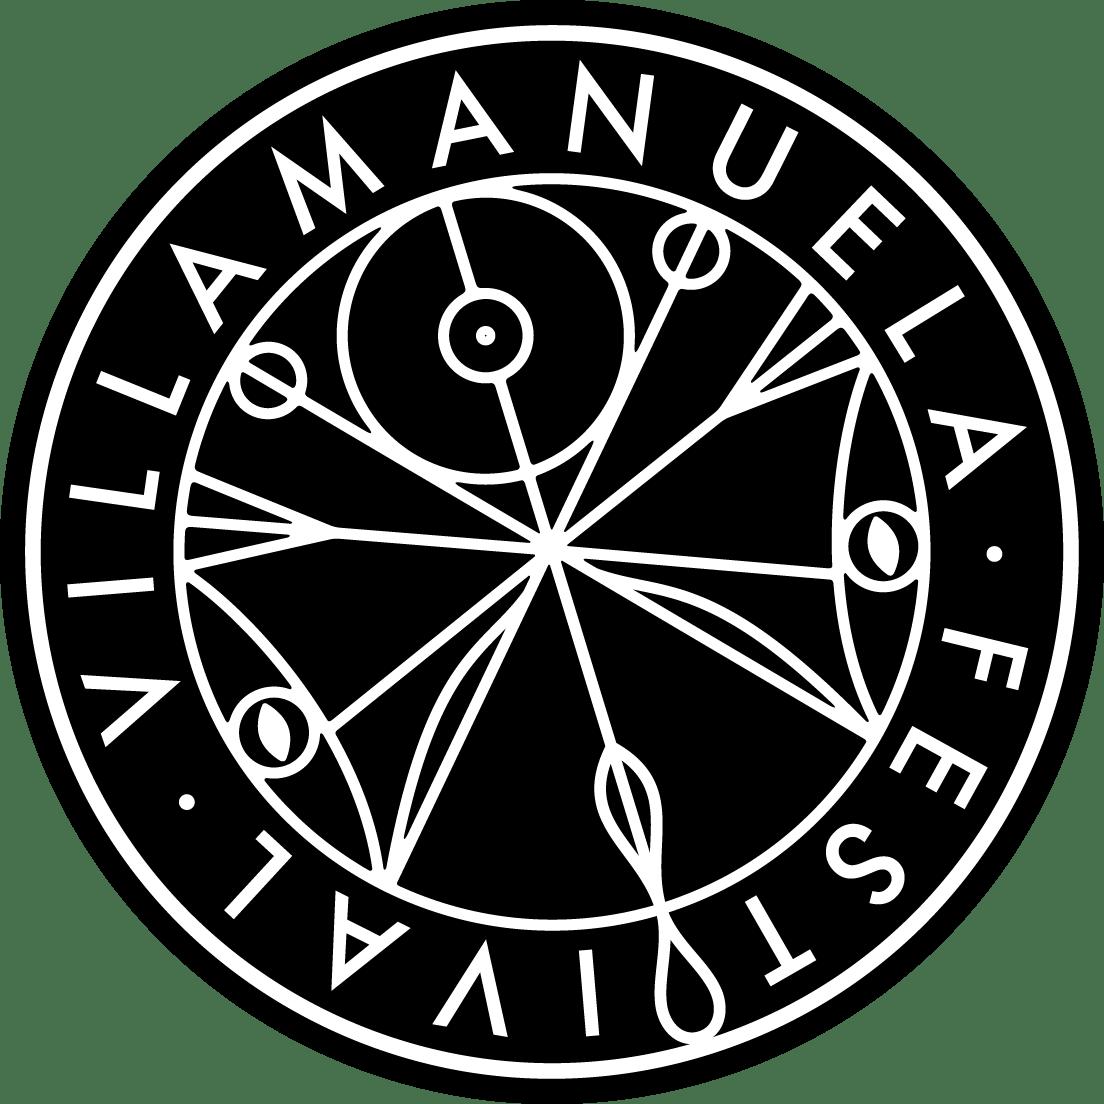 villamanuela_logo